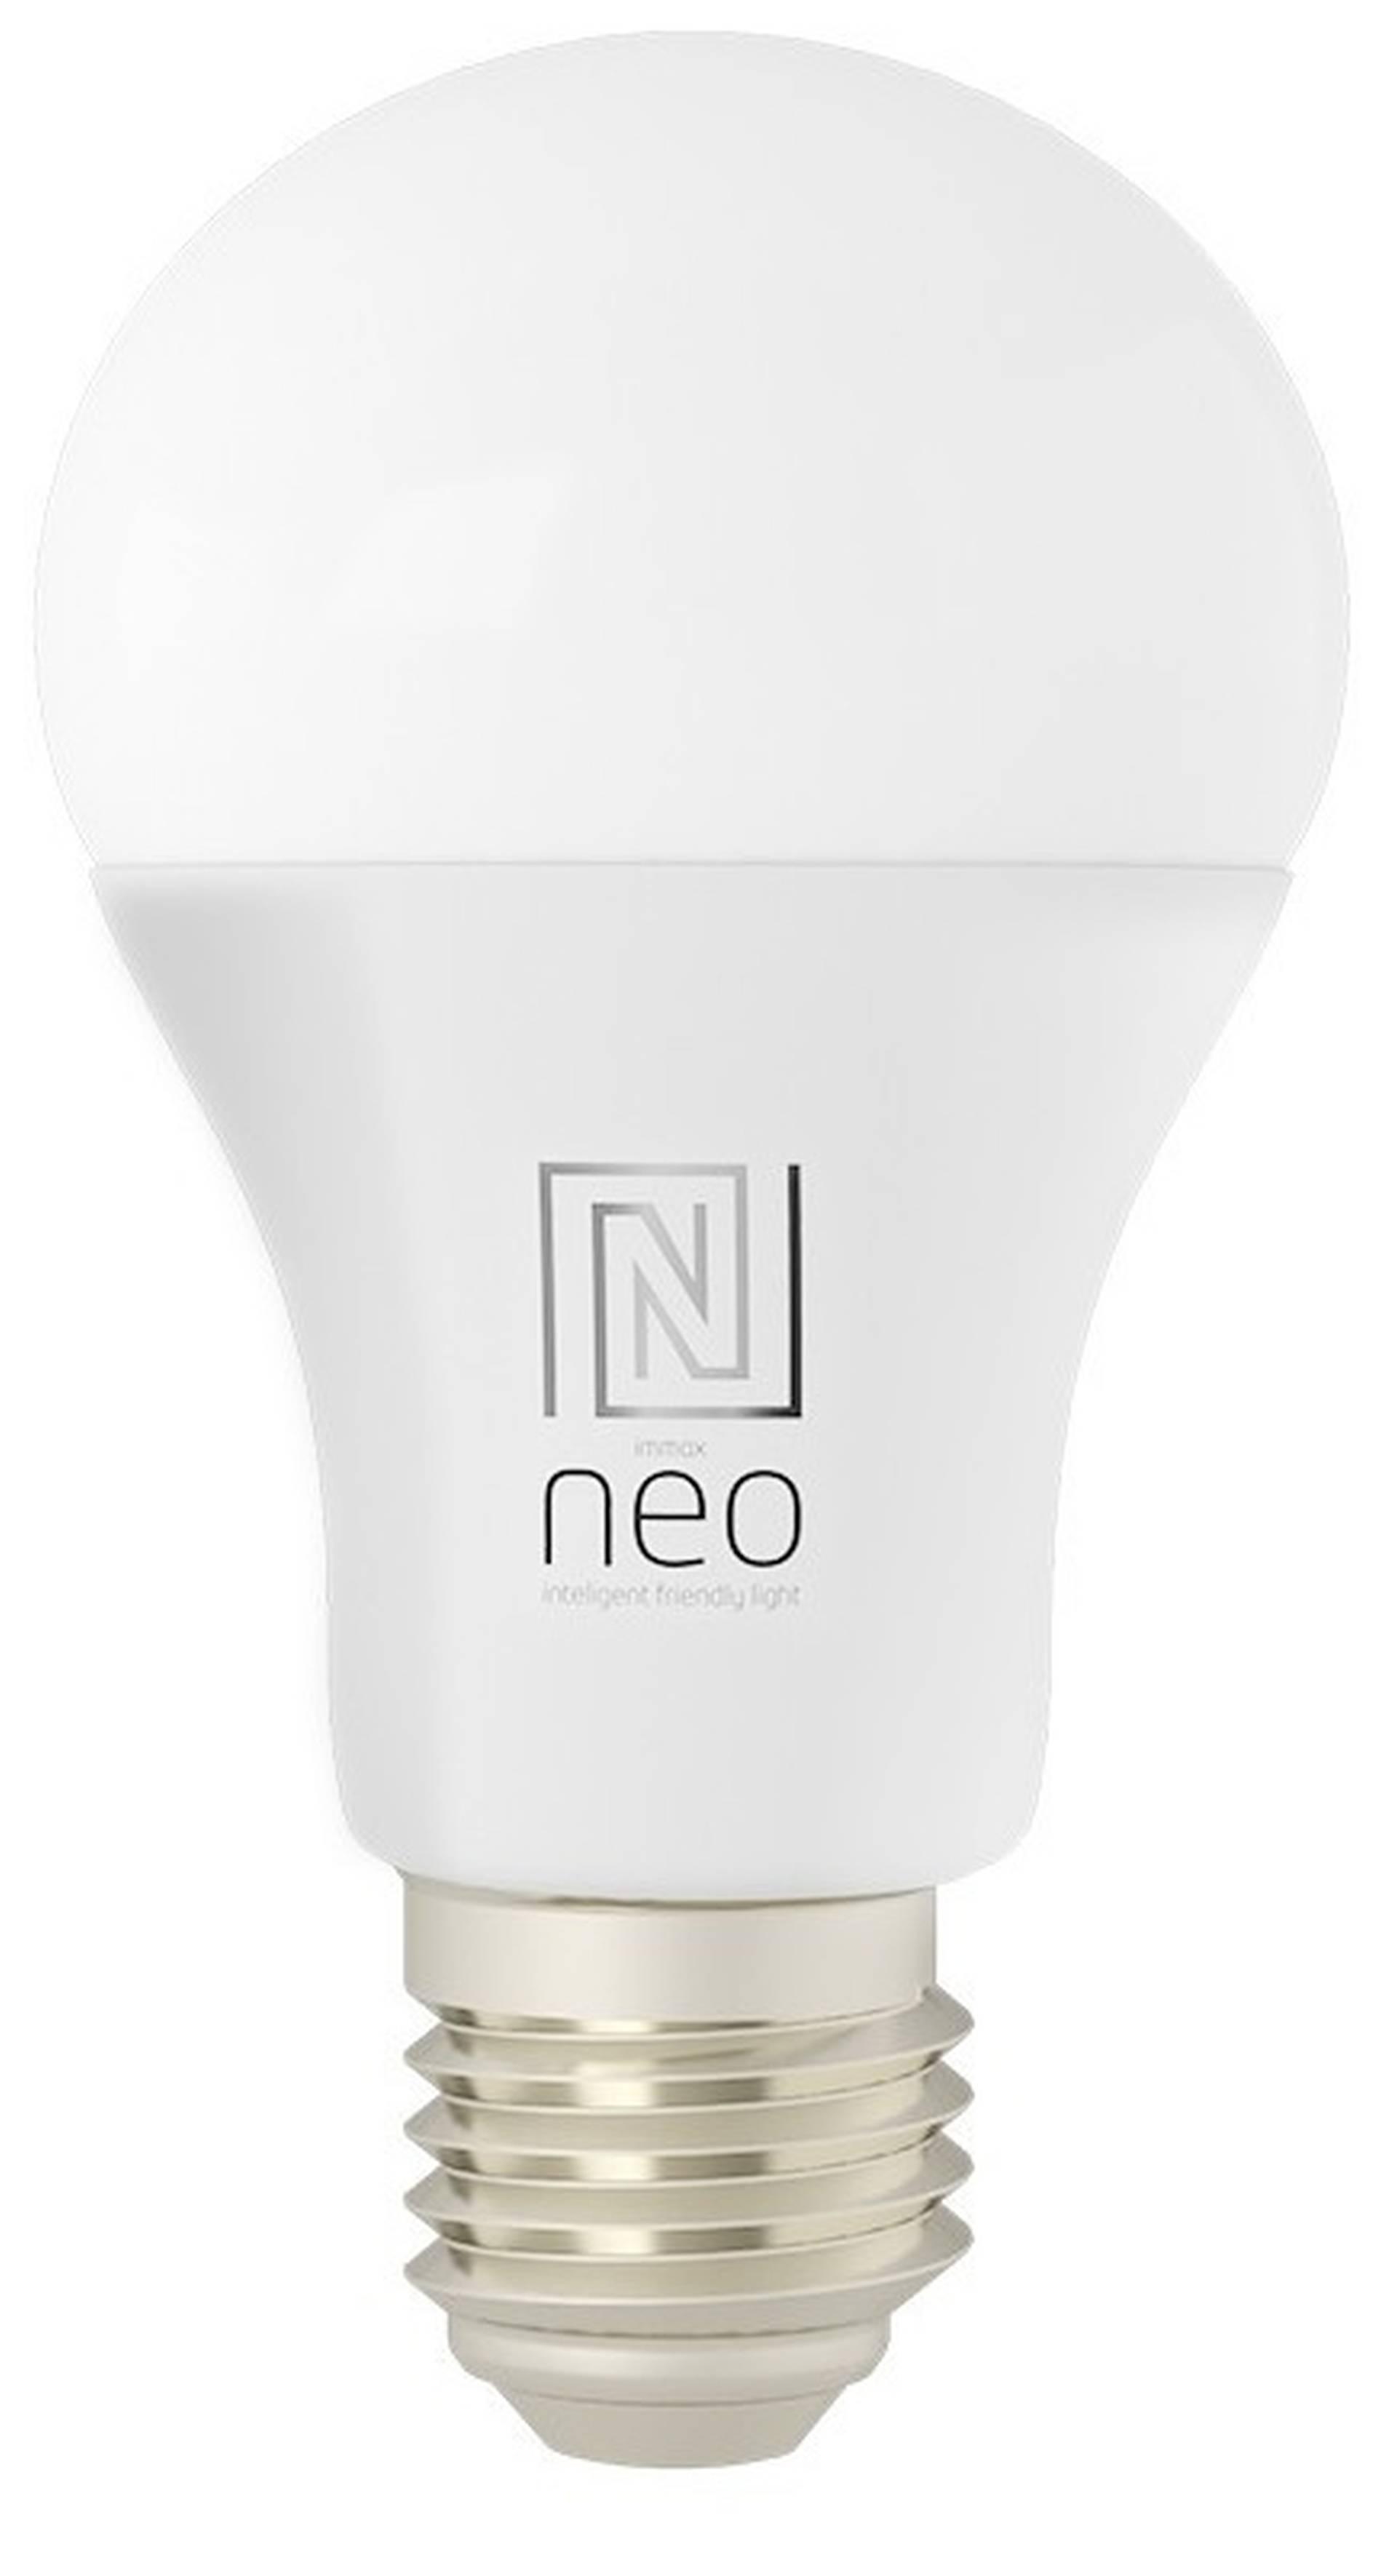 Immax SMART LED žiarovka RGBW CCT 9W E27 07115L